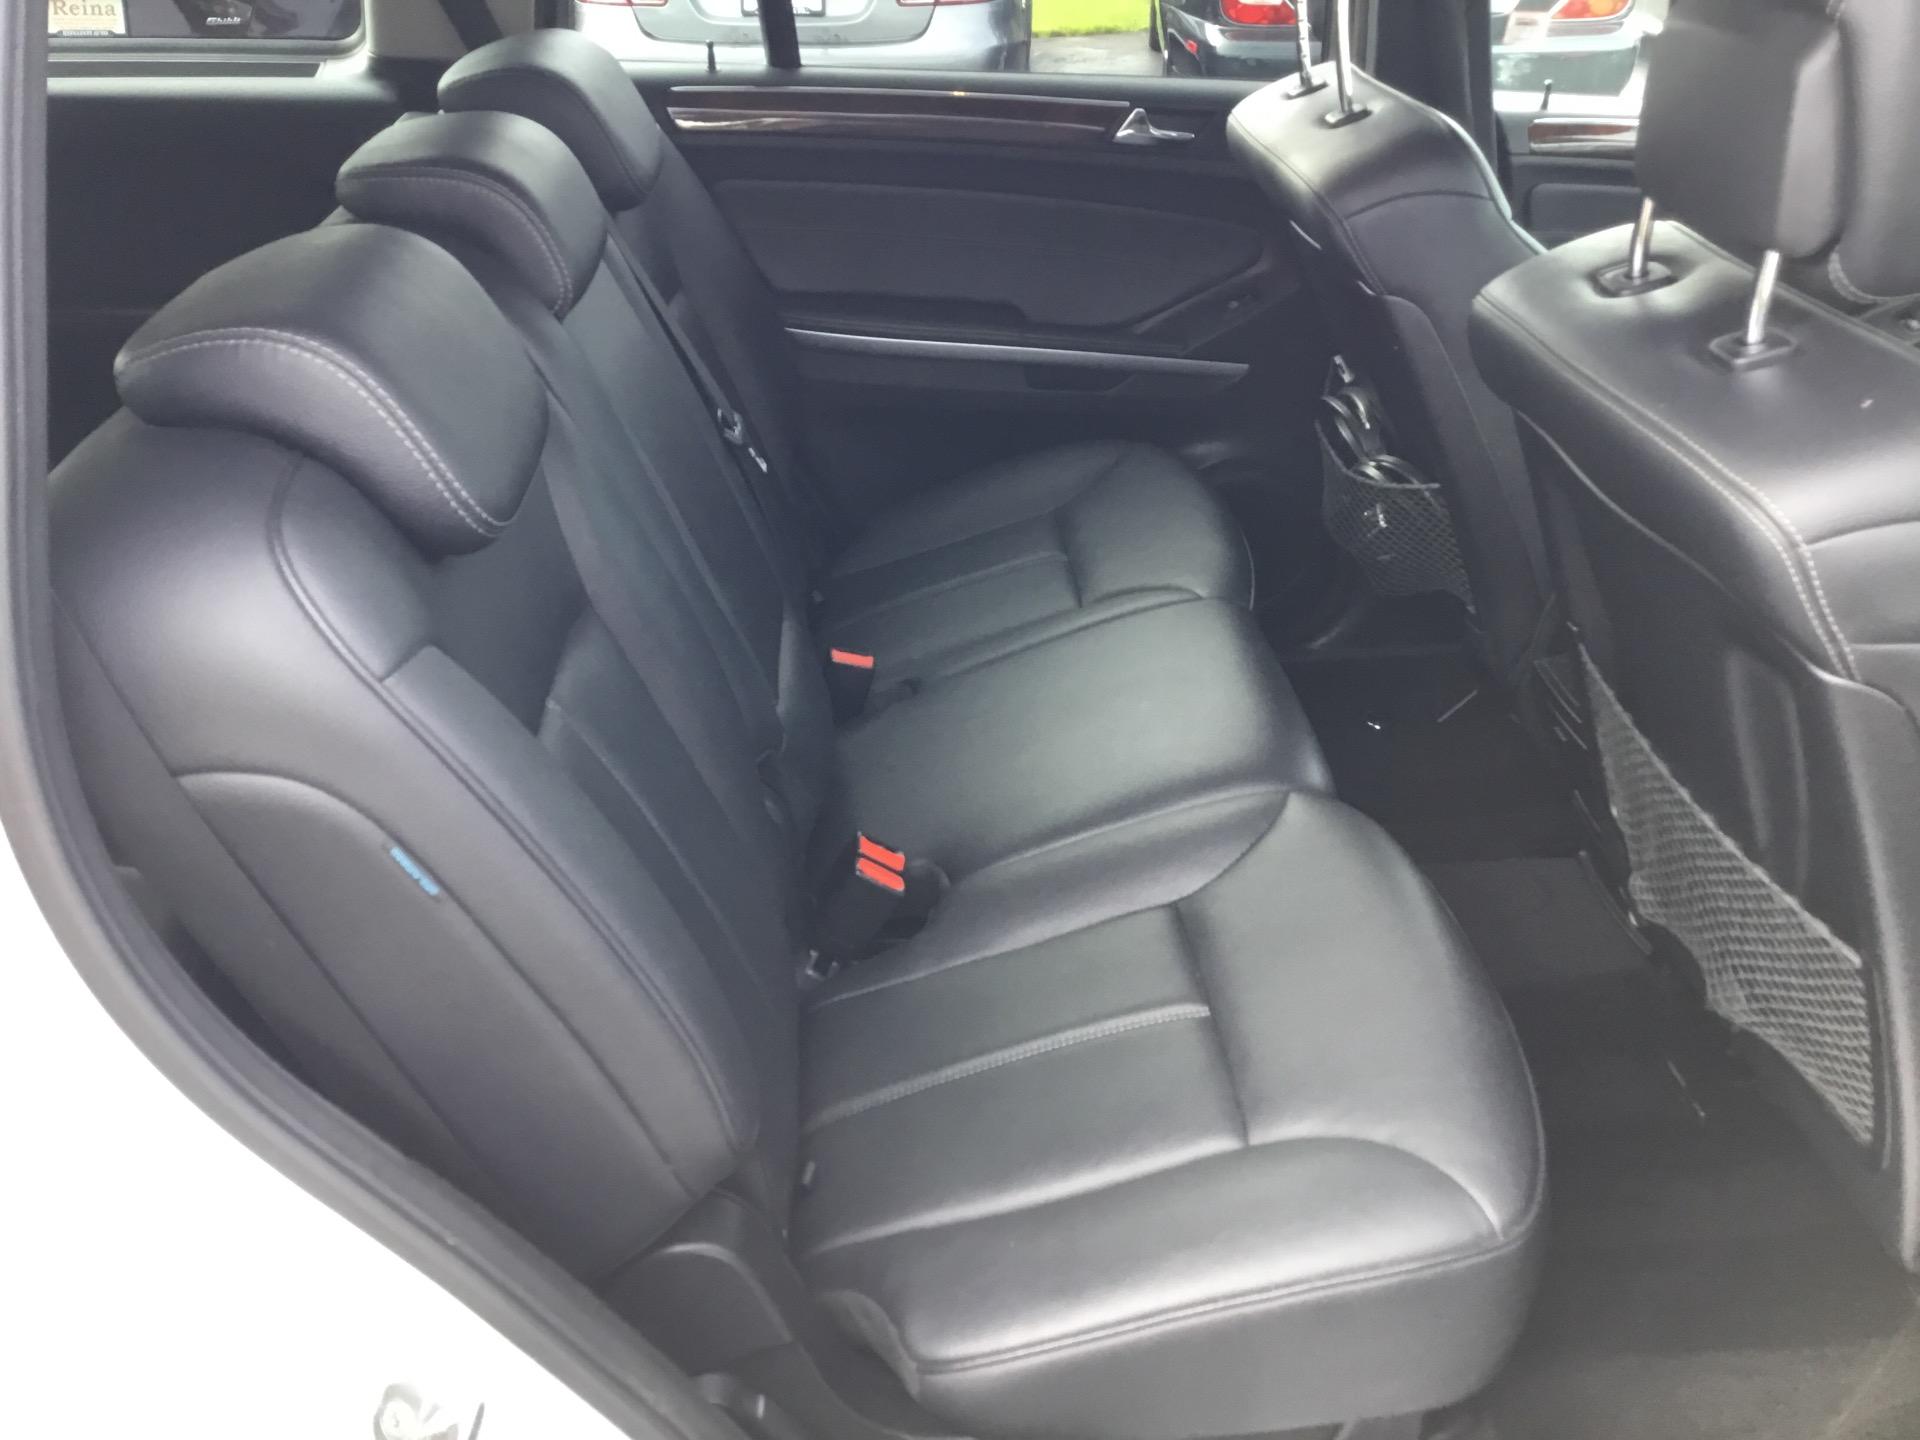 Used-2010-Mercedes-Benz-GL-450-4Matic-GL-450-4MATIC